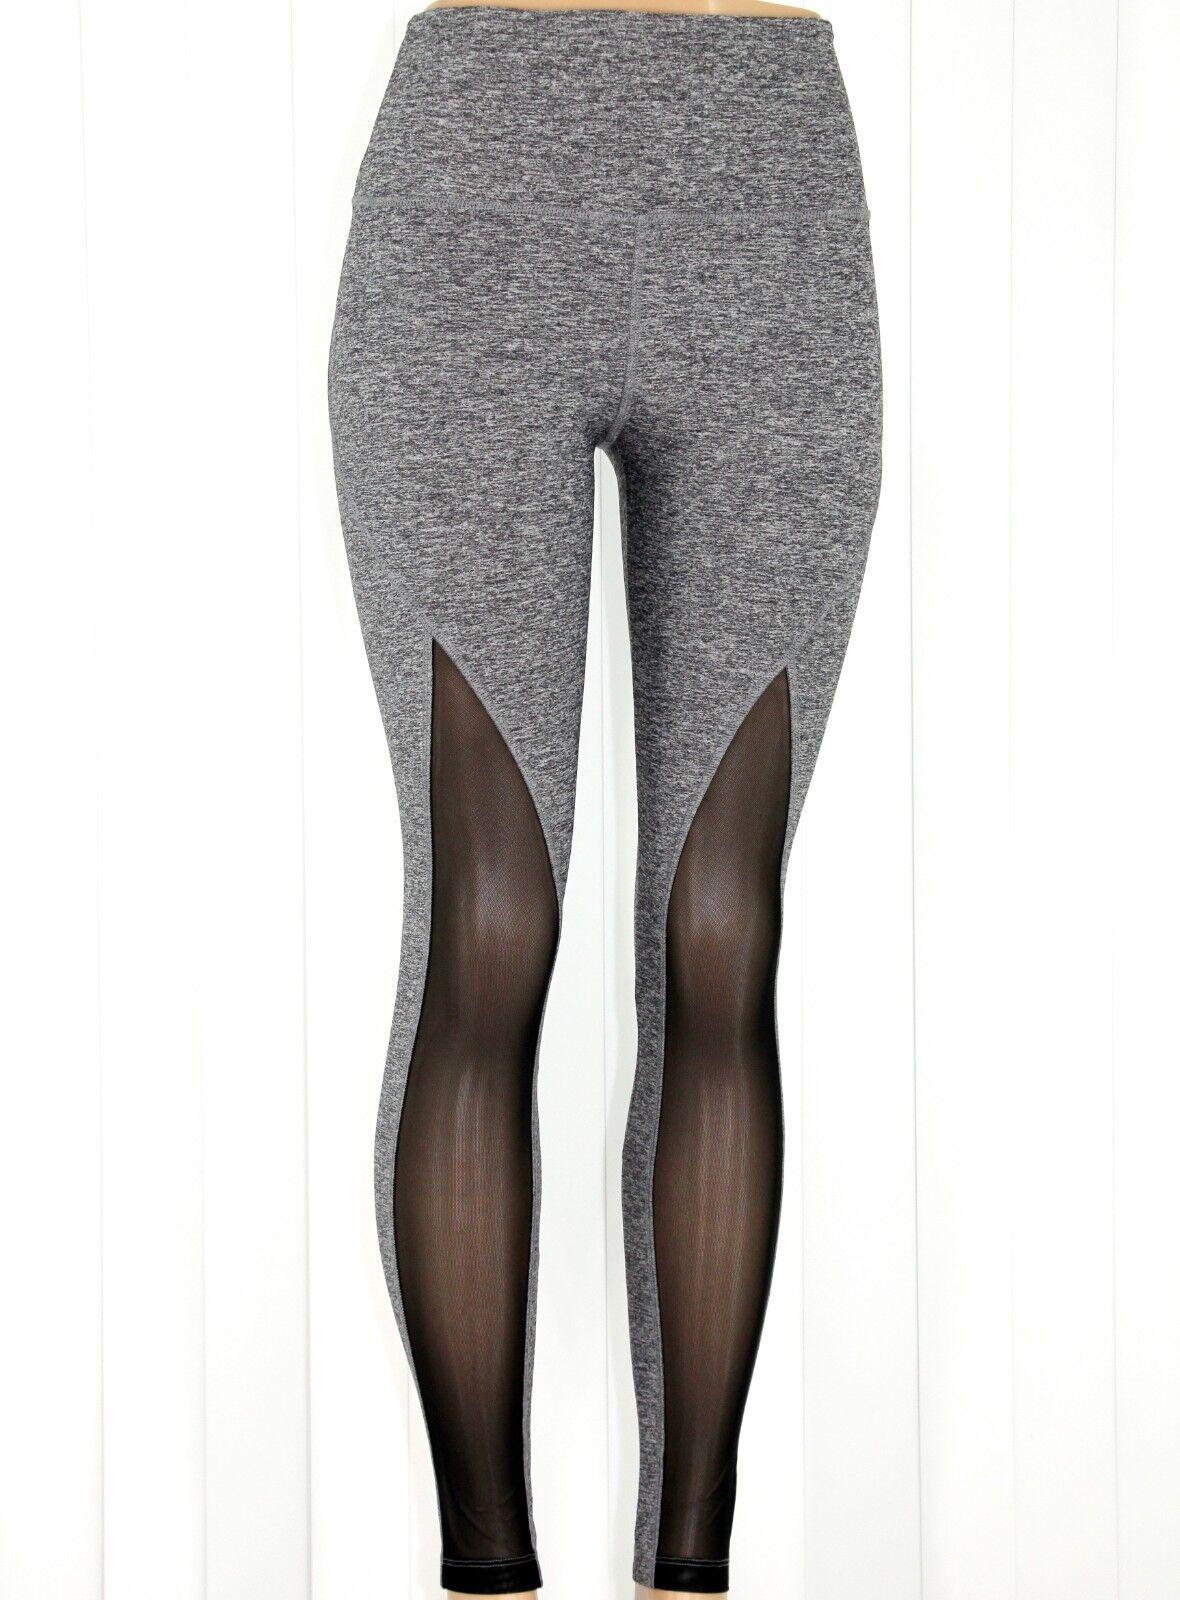 NWT Victoria's Secret PINK ULTIMATE HIGH-WAIST LEGGING YOGA PANT MEDIUM XX517